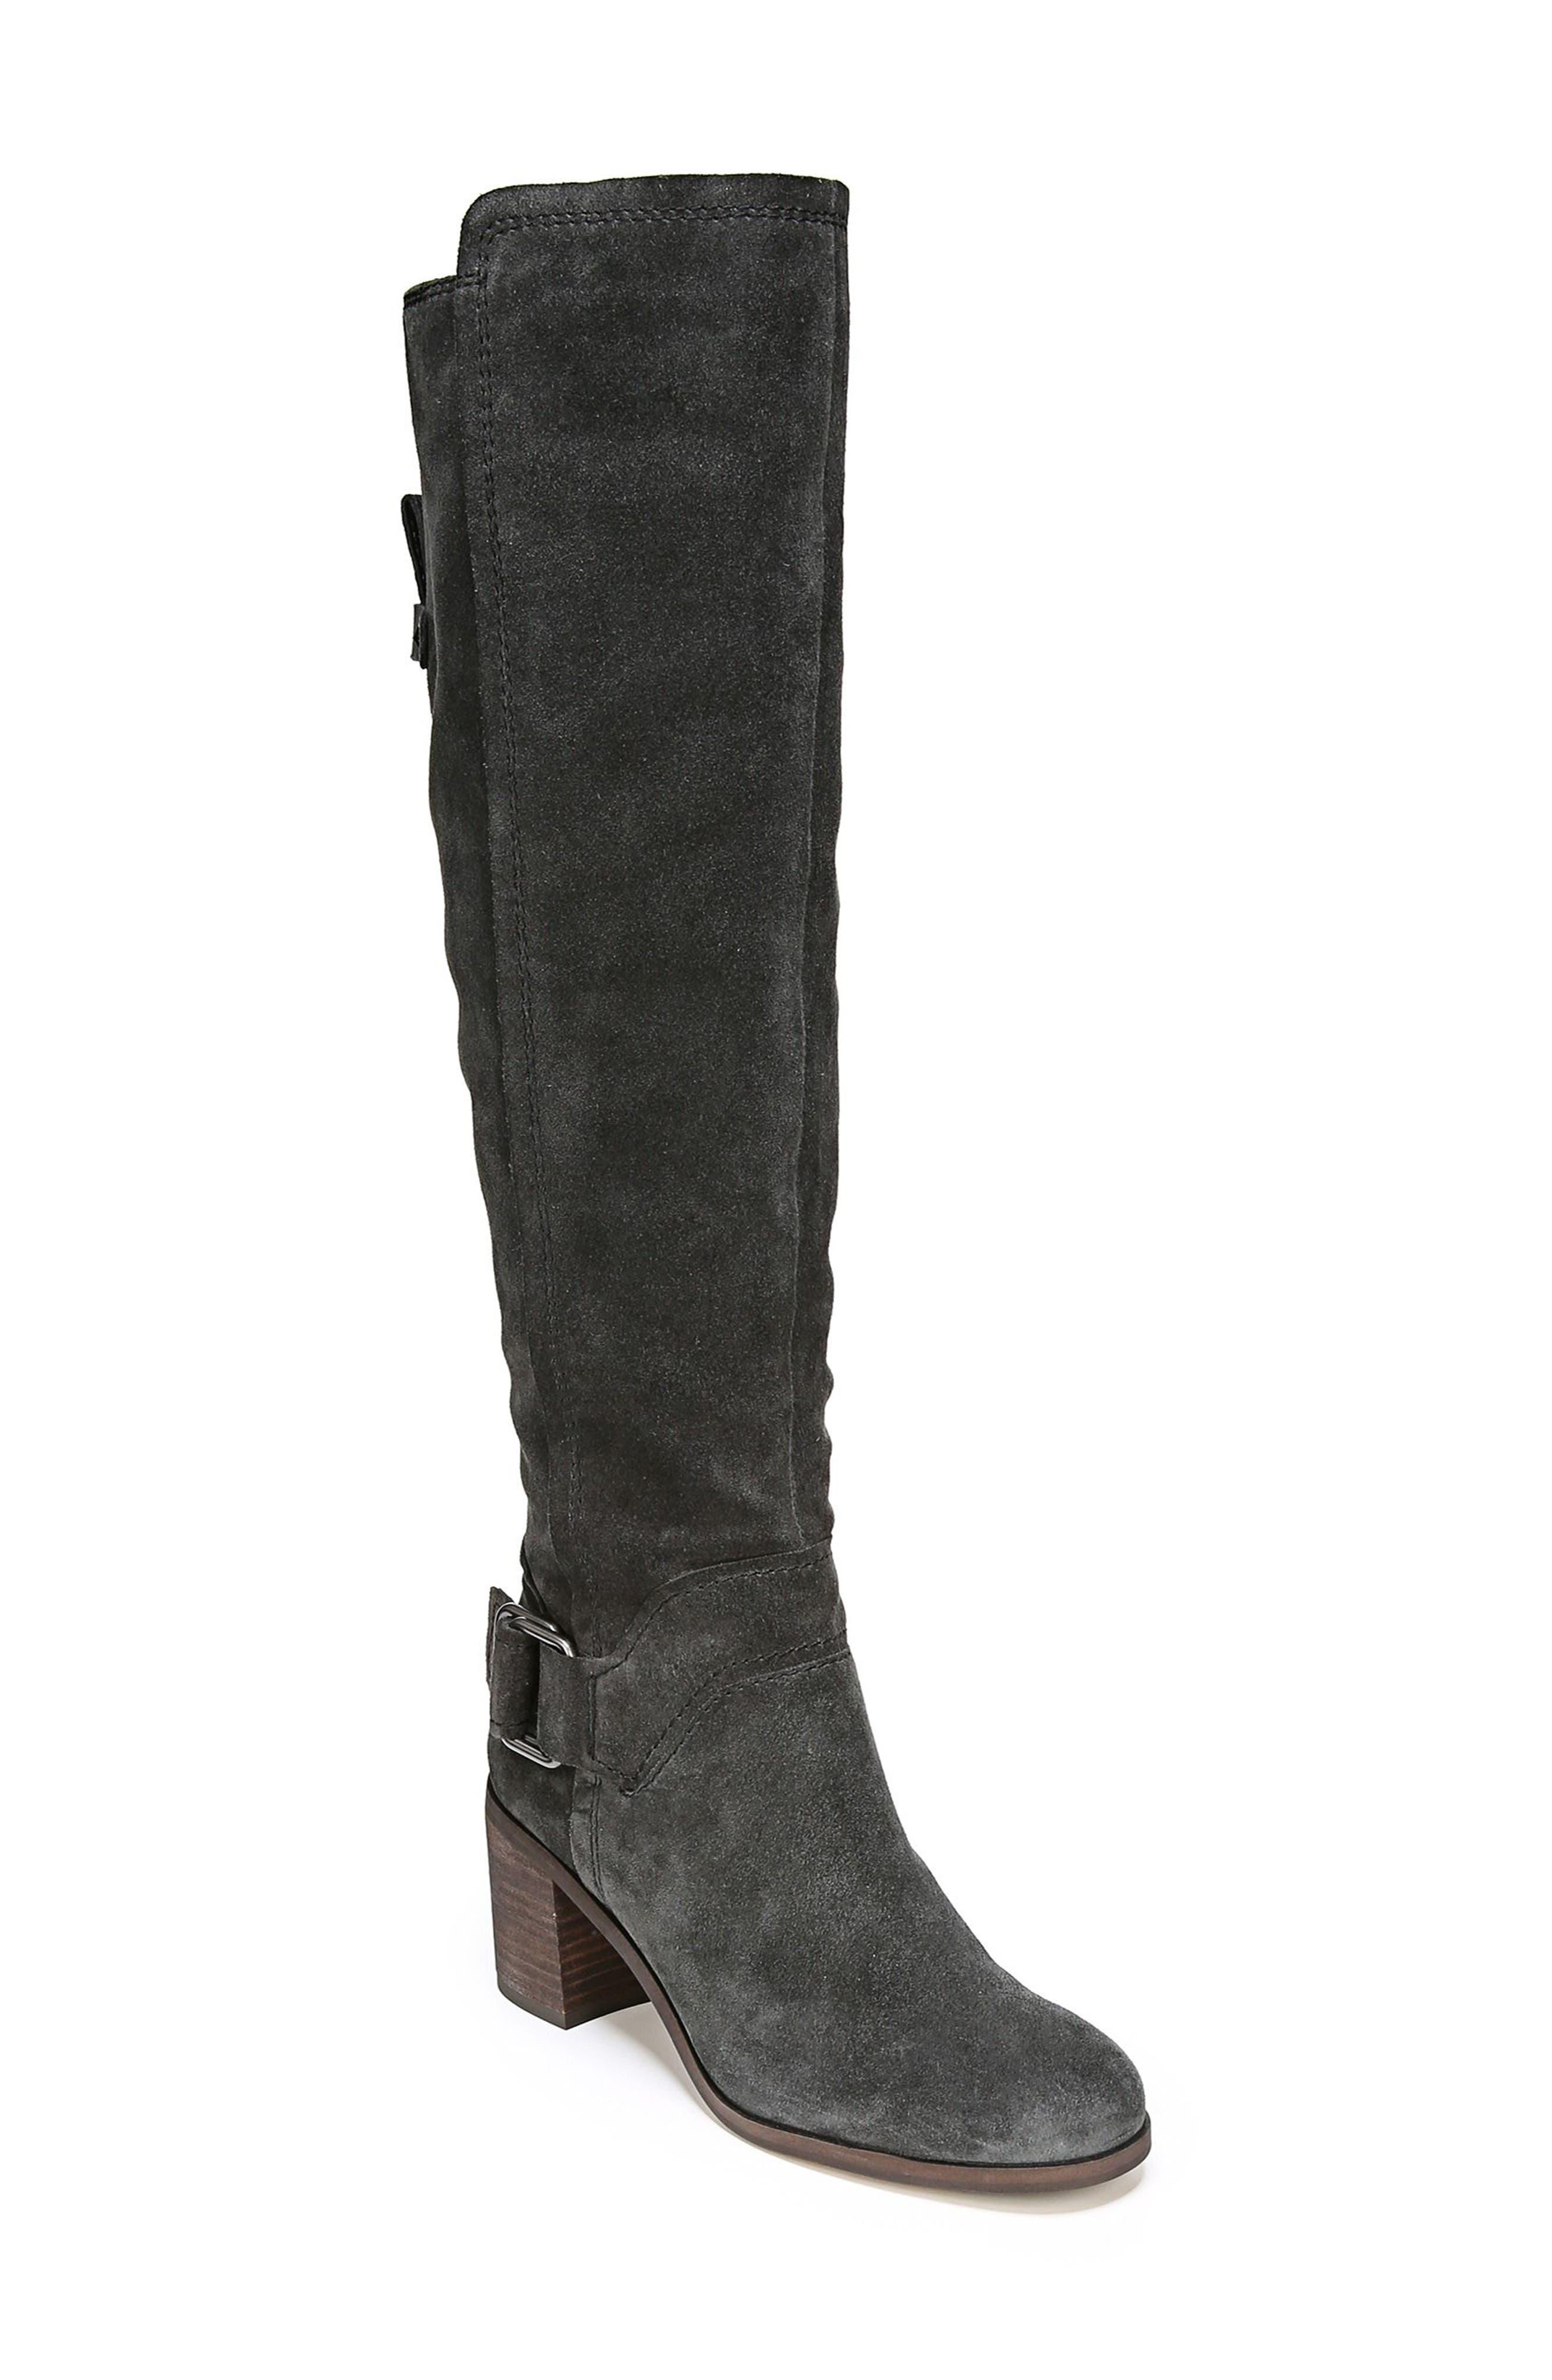 Mystic Knee High Boot,                             Main thumbnail 1, color,                             Coal Suede